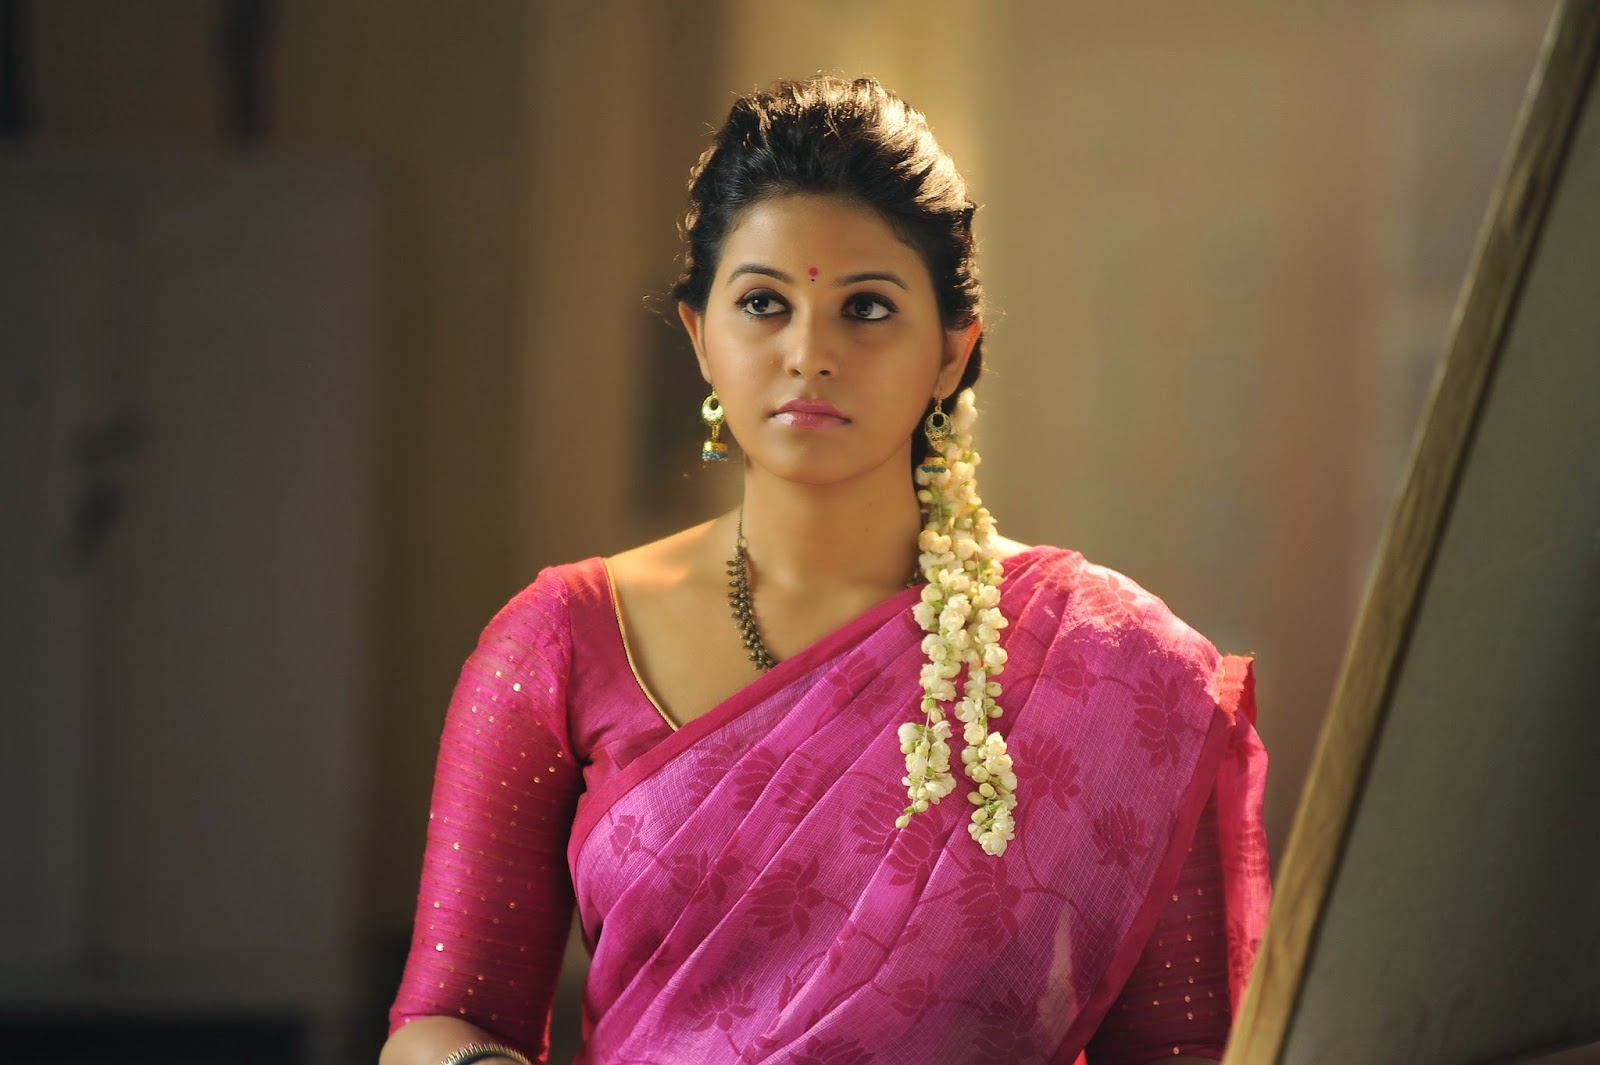 Telugu Actress Jyothi In Blue Salwar: Actress Anjali In Pink Saree From Geethanjali Movie